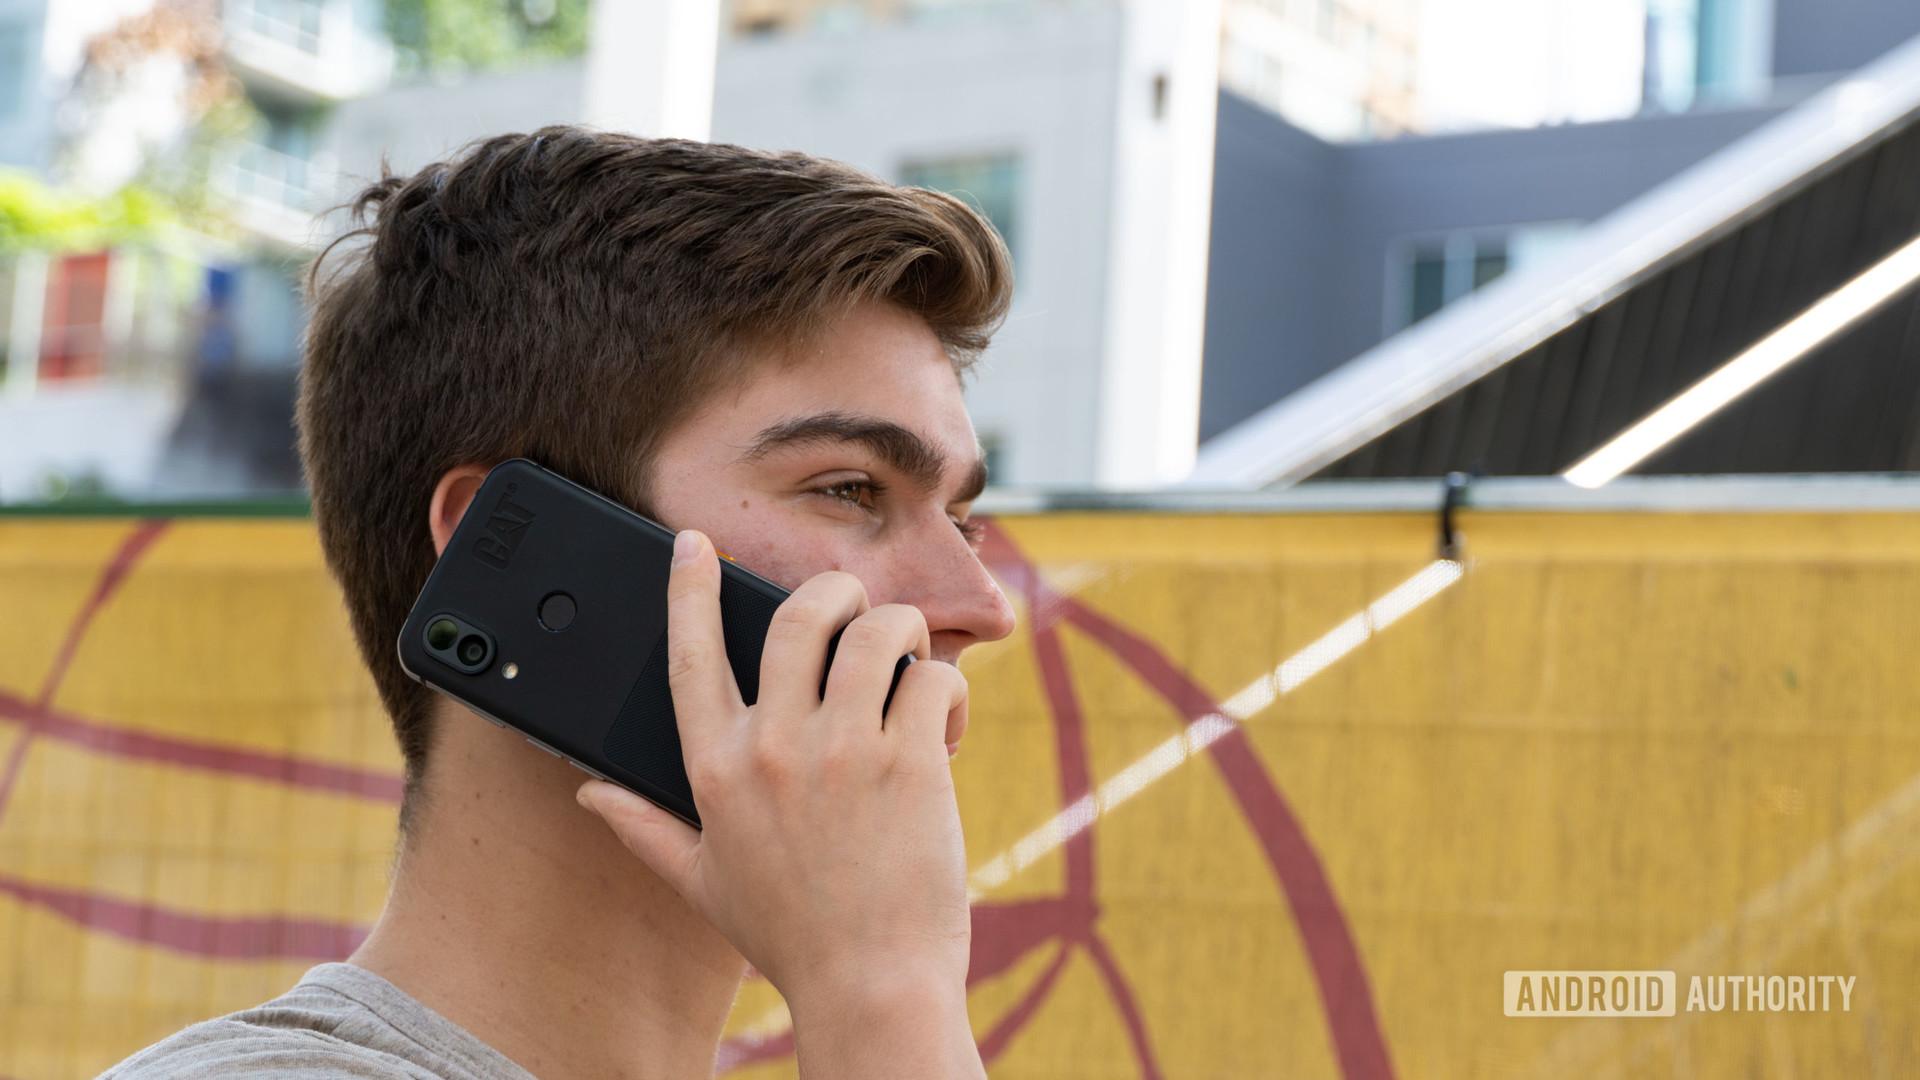 Cat S62 Pro man talking on phone.